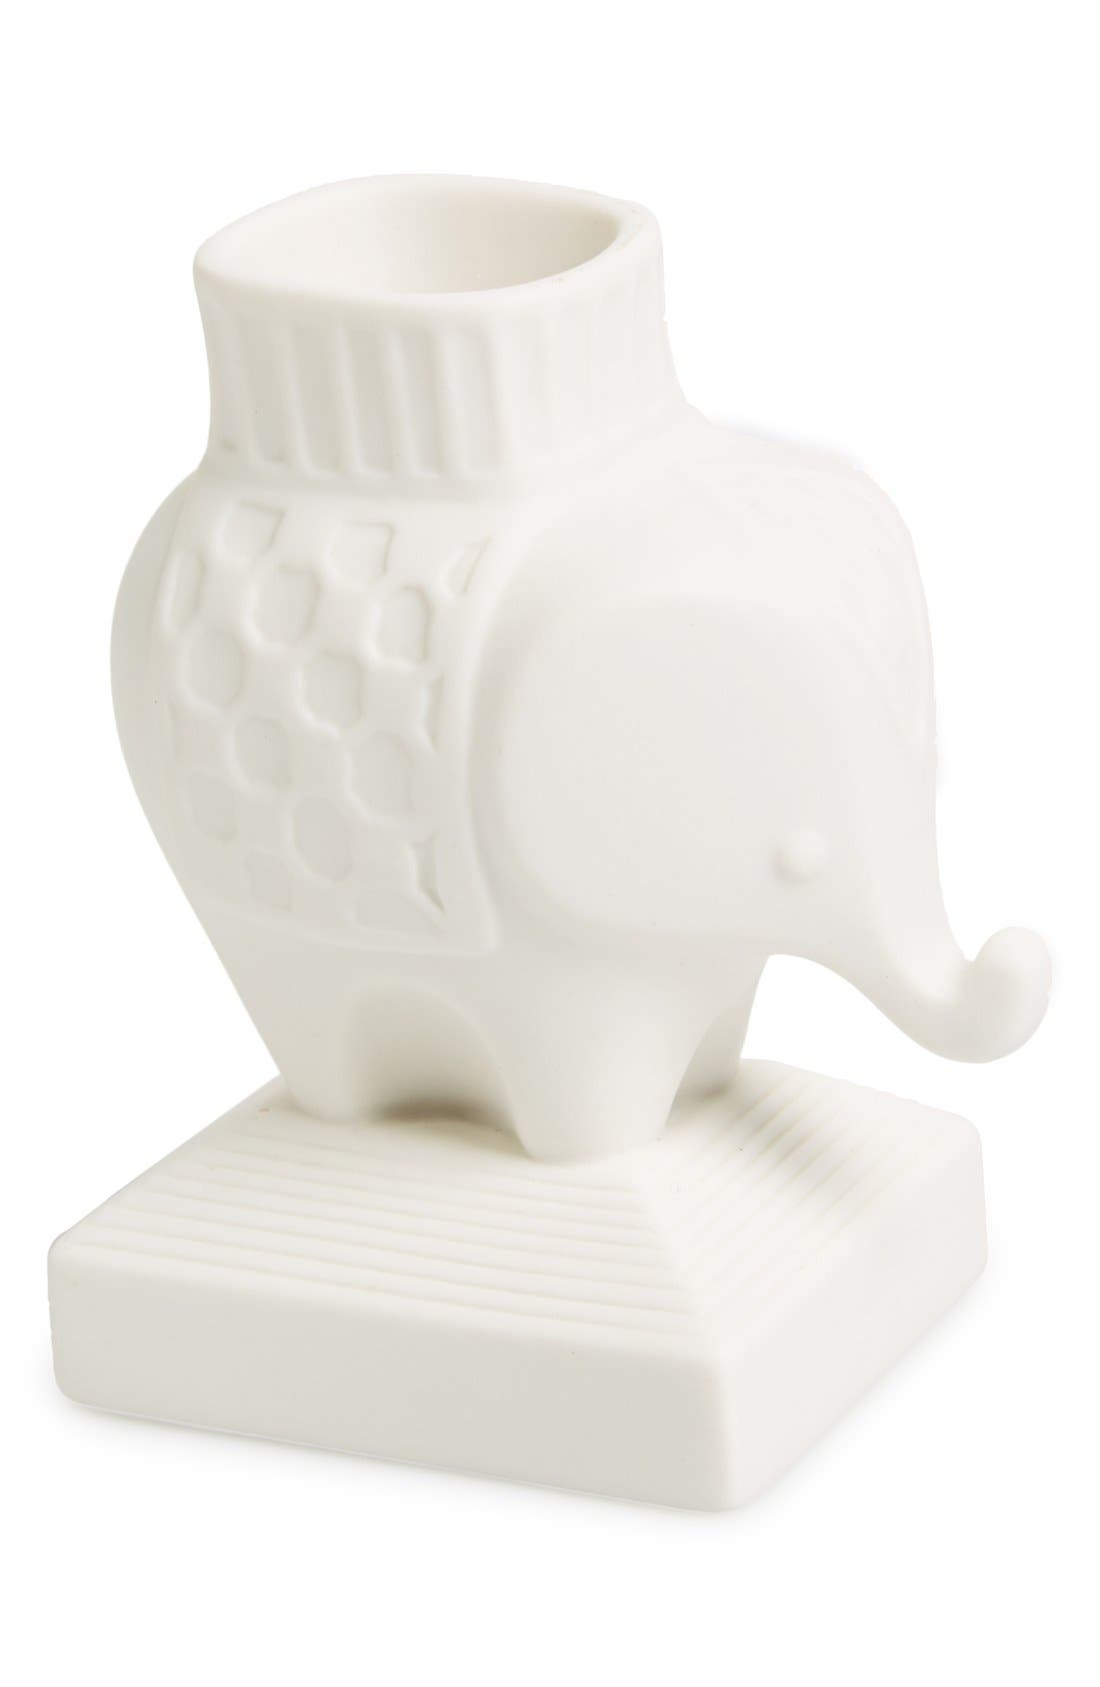 Main Image - Jonathan Adler Porcelain Elephant Match Strike